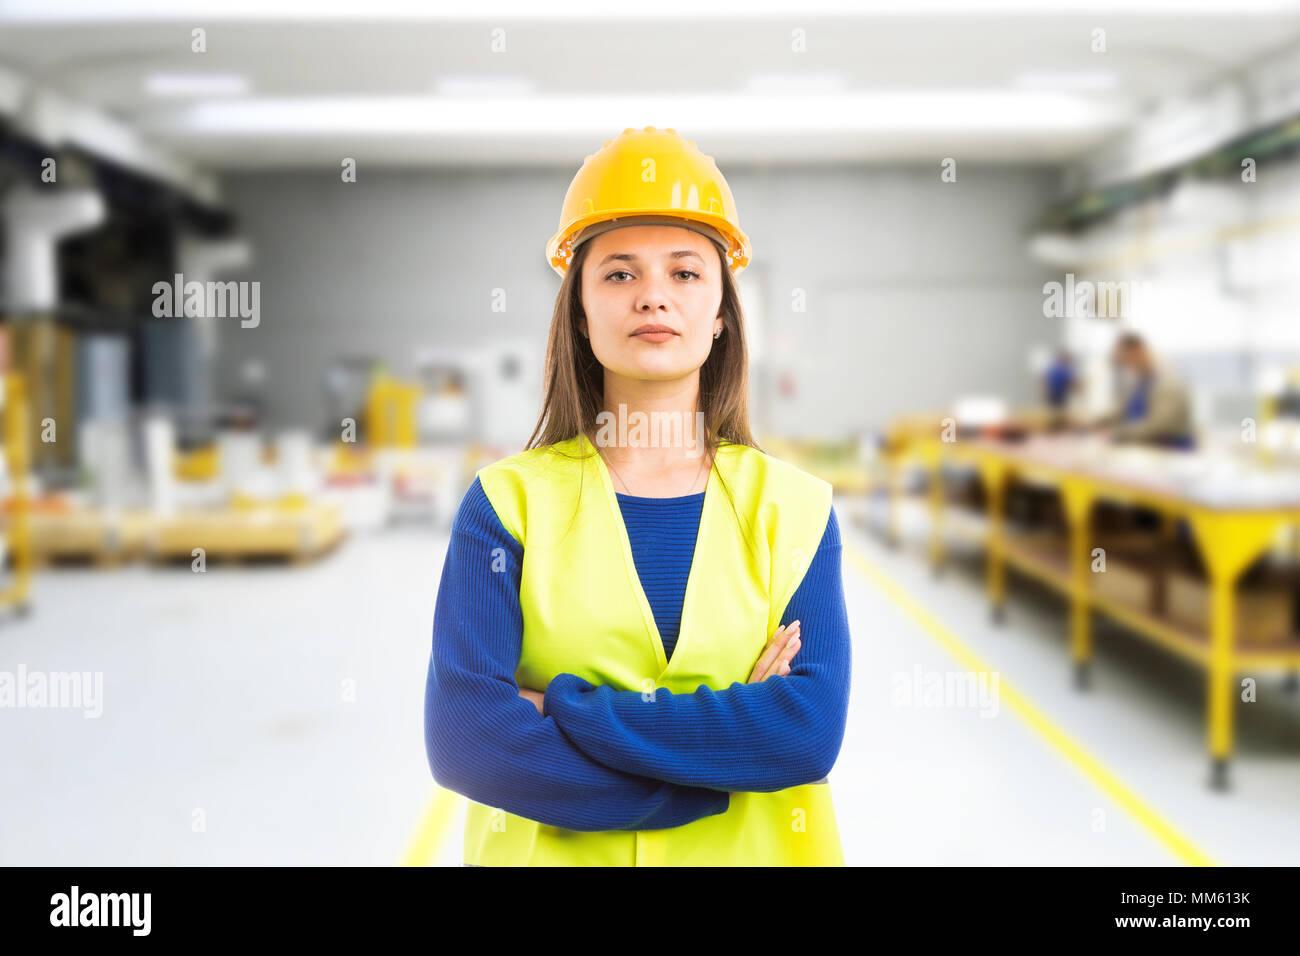 Orgulloso seguro joven ingeniero con los brazos cruzados como supervisor profesional en concepto de fondo de fábrica interiores Imagen De Stock